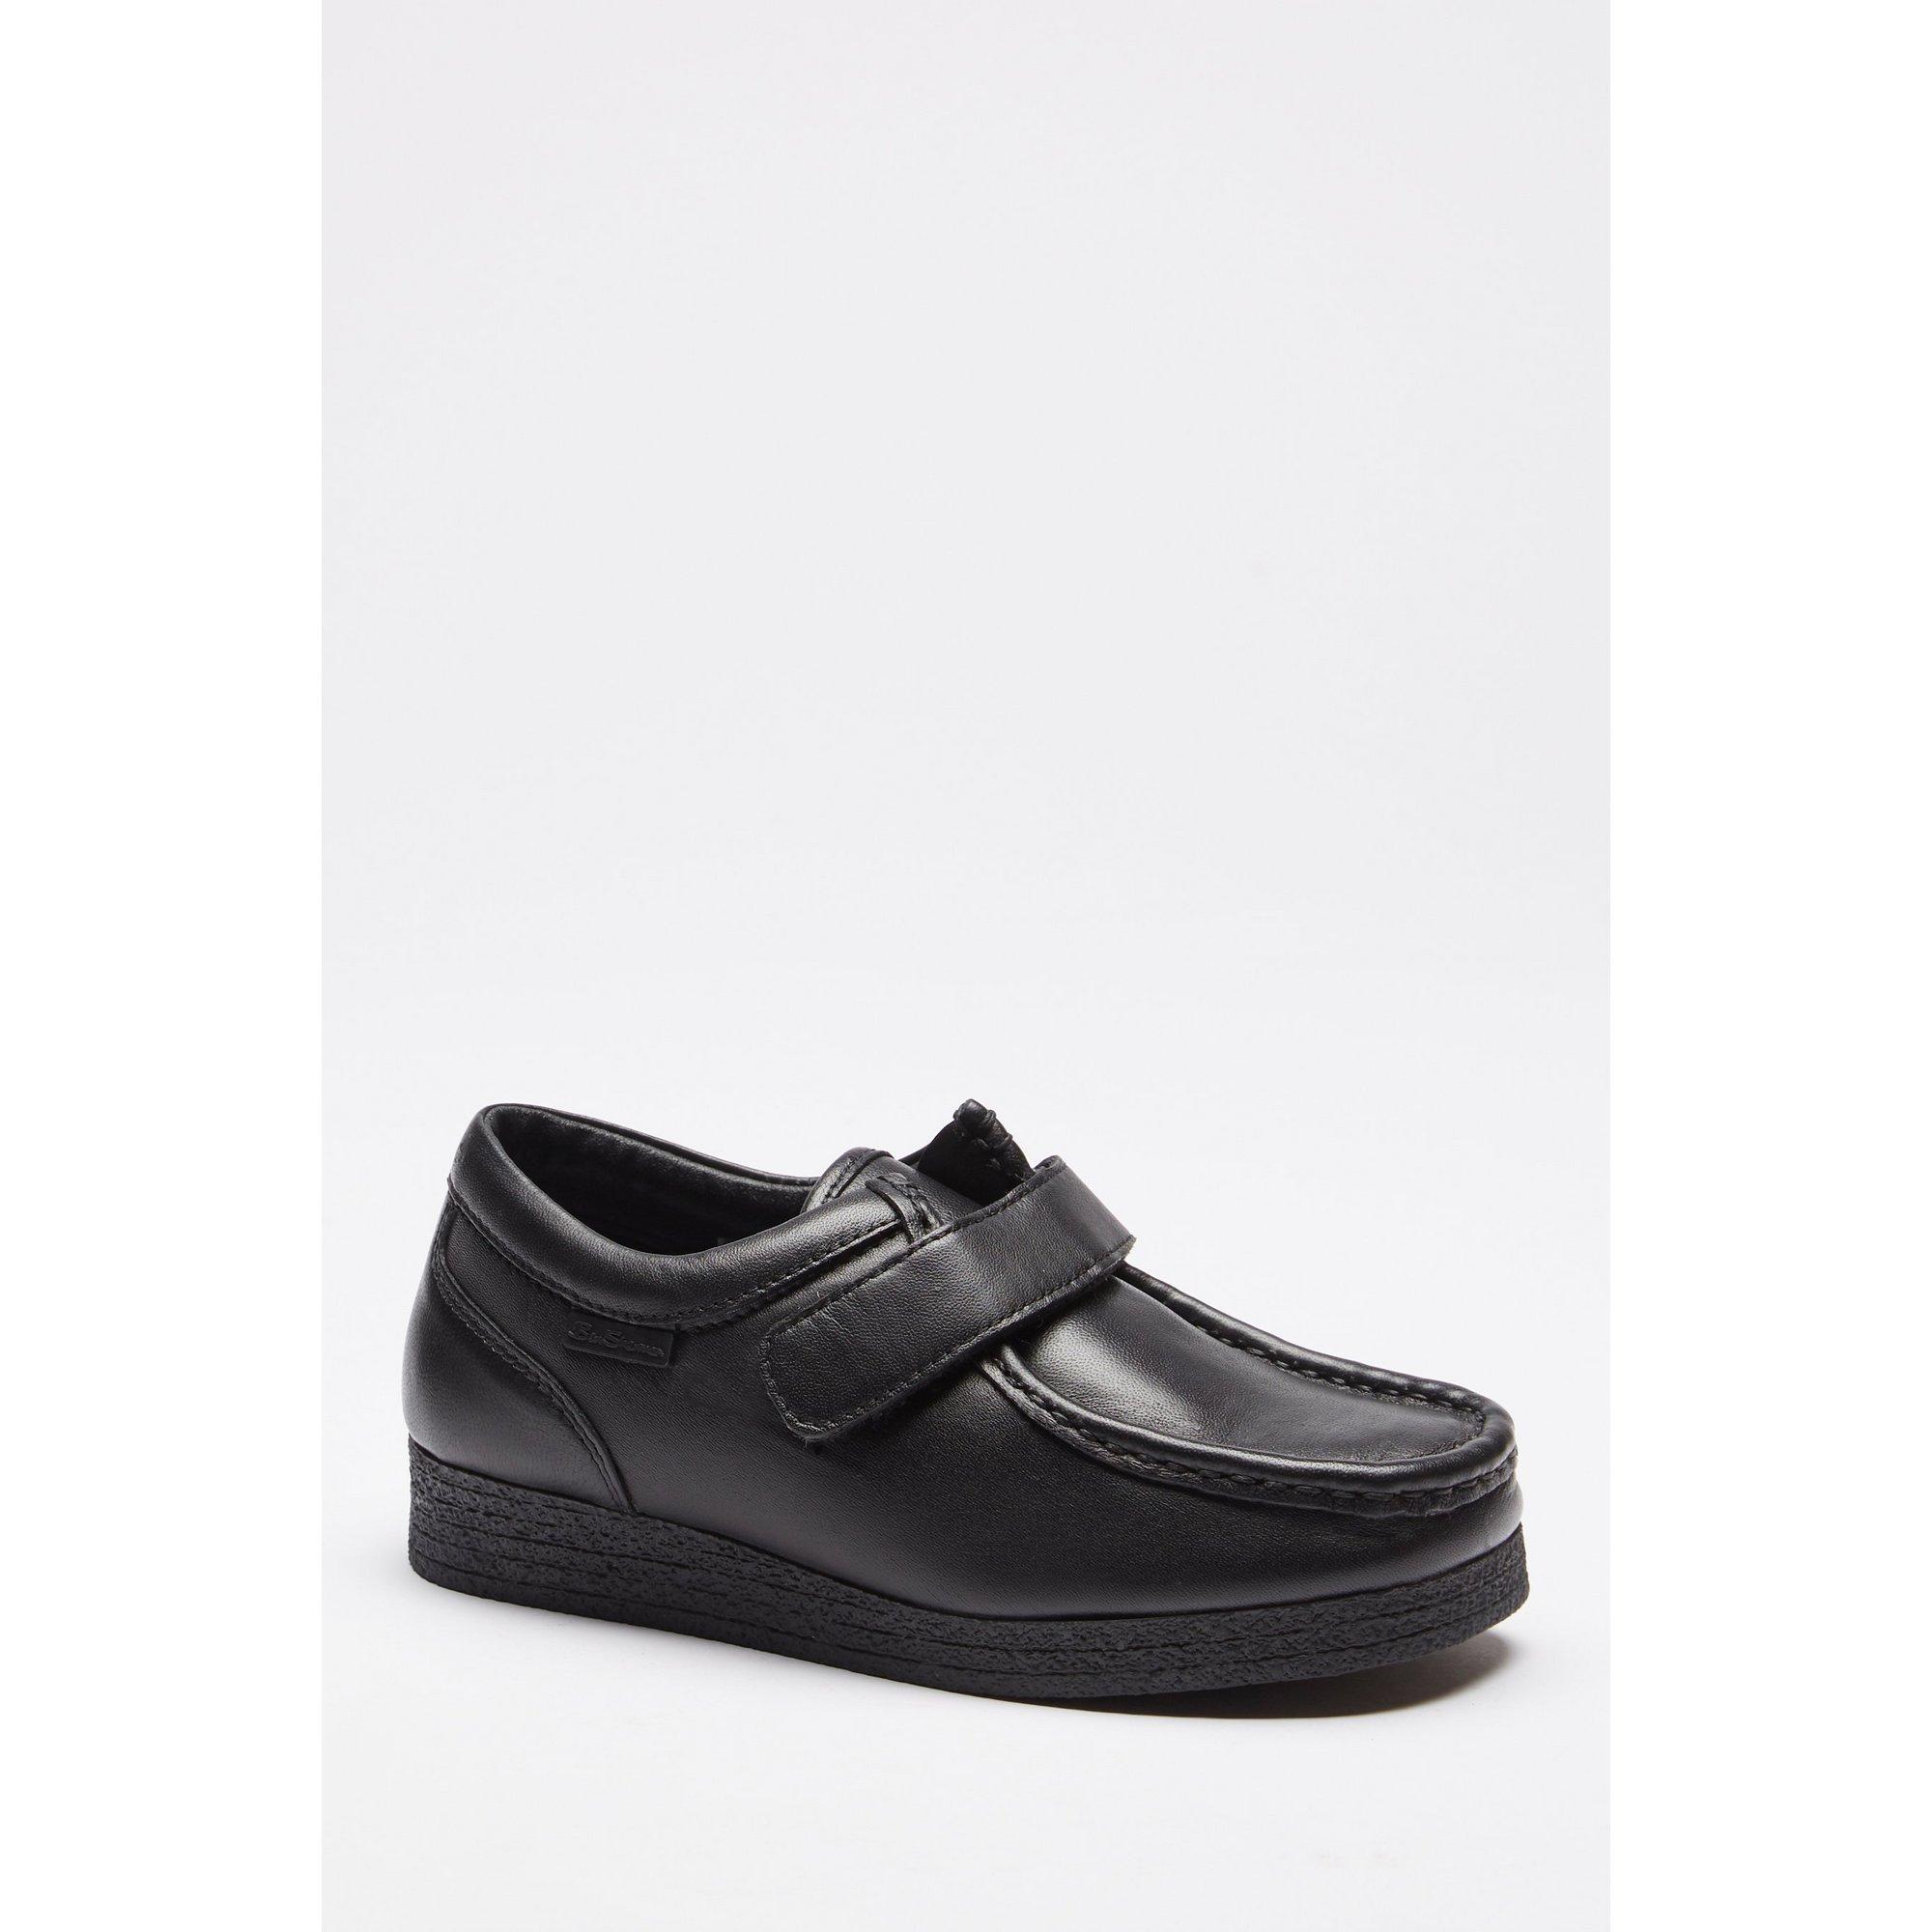 Image of Ben Sherman Quad Velcro Leather Shoes